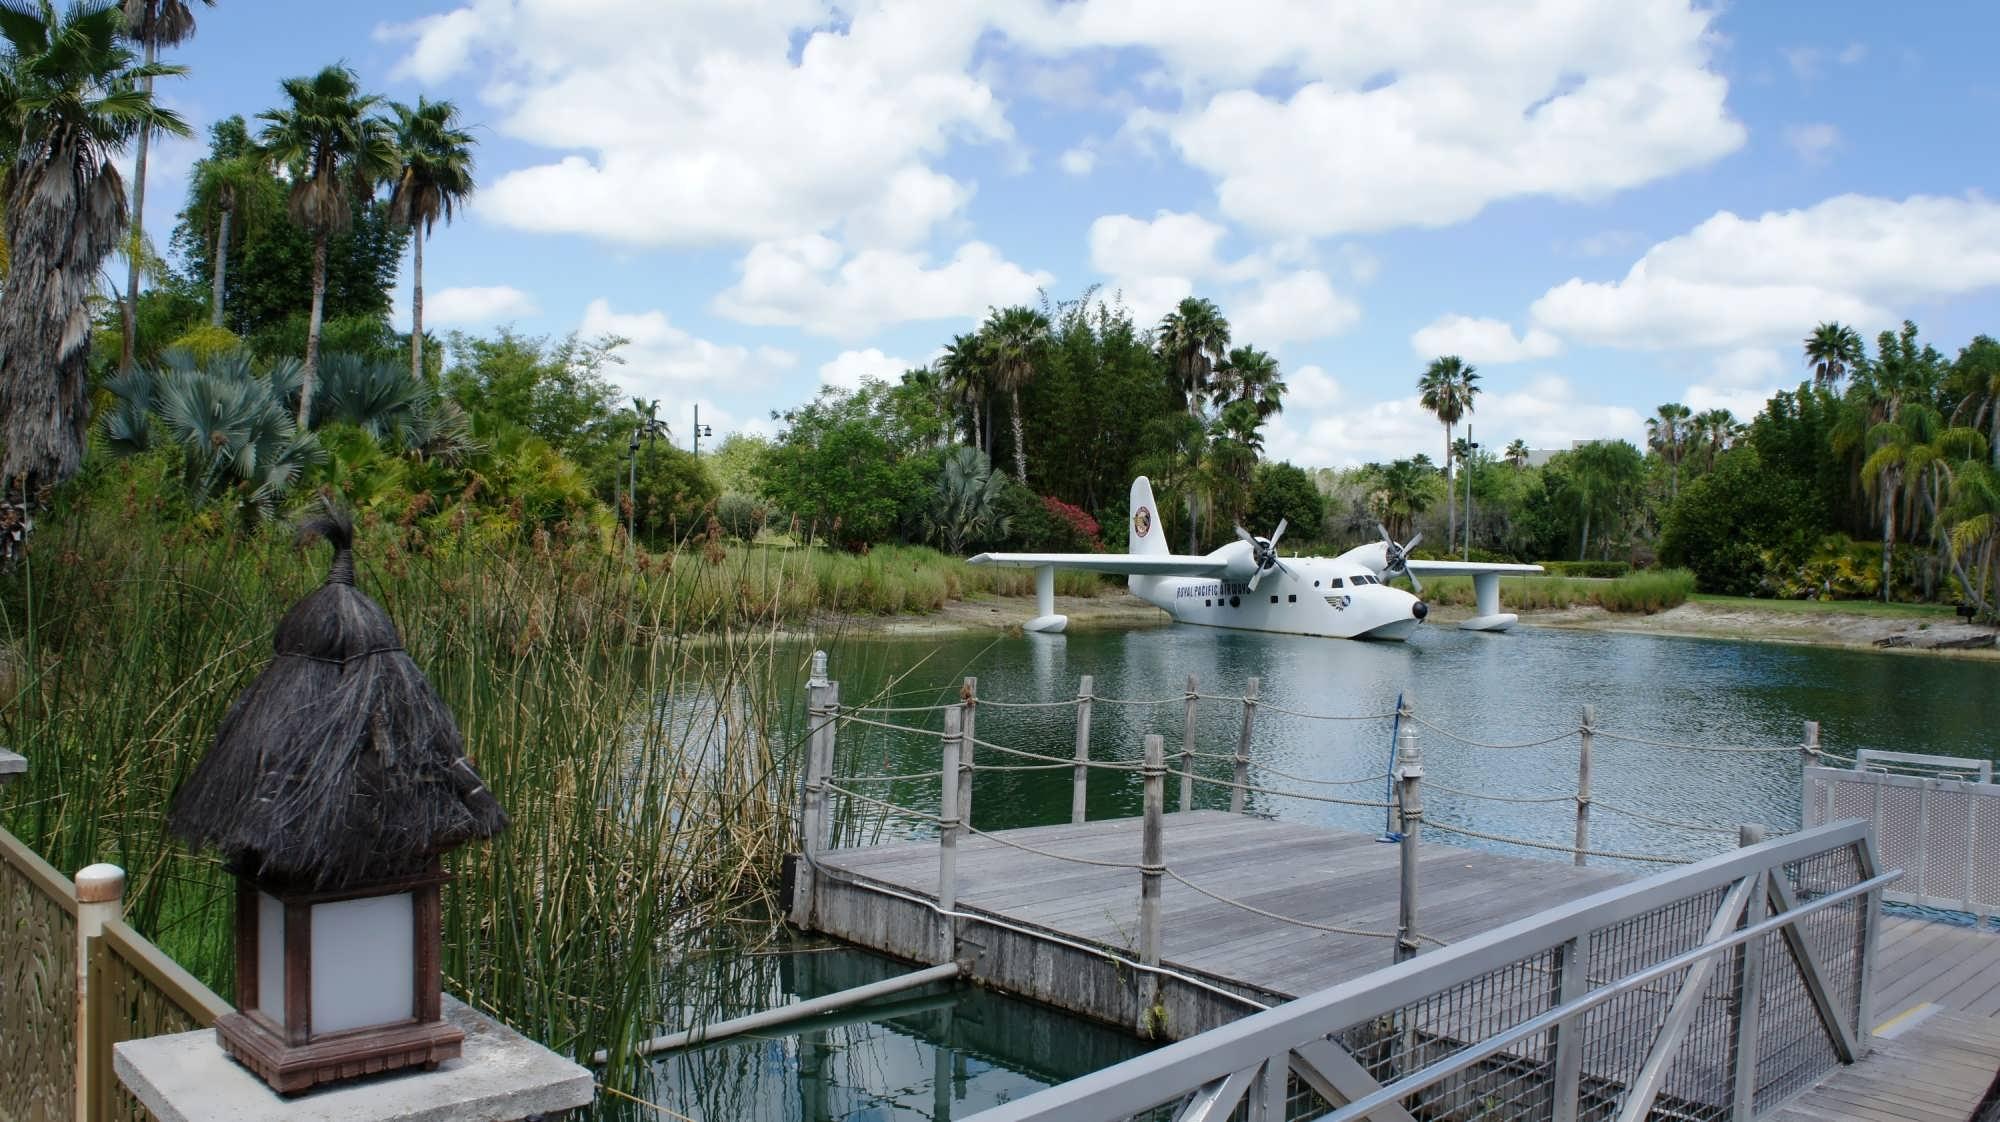 Water taxi dock at Royal Pacific Resort